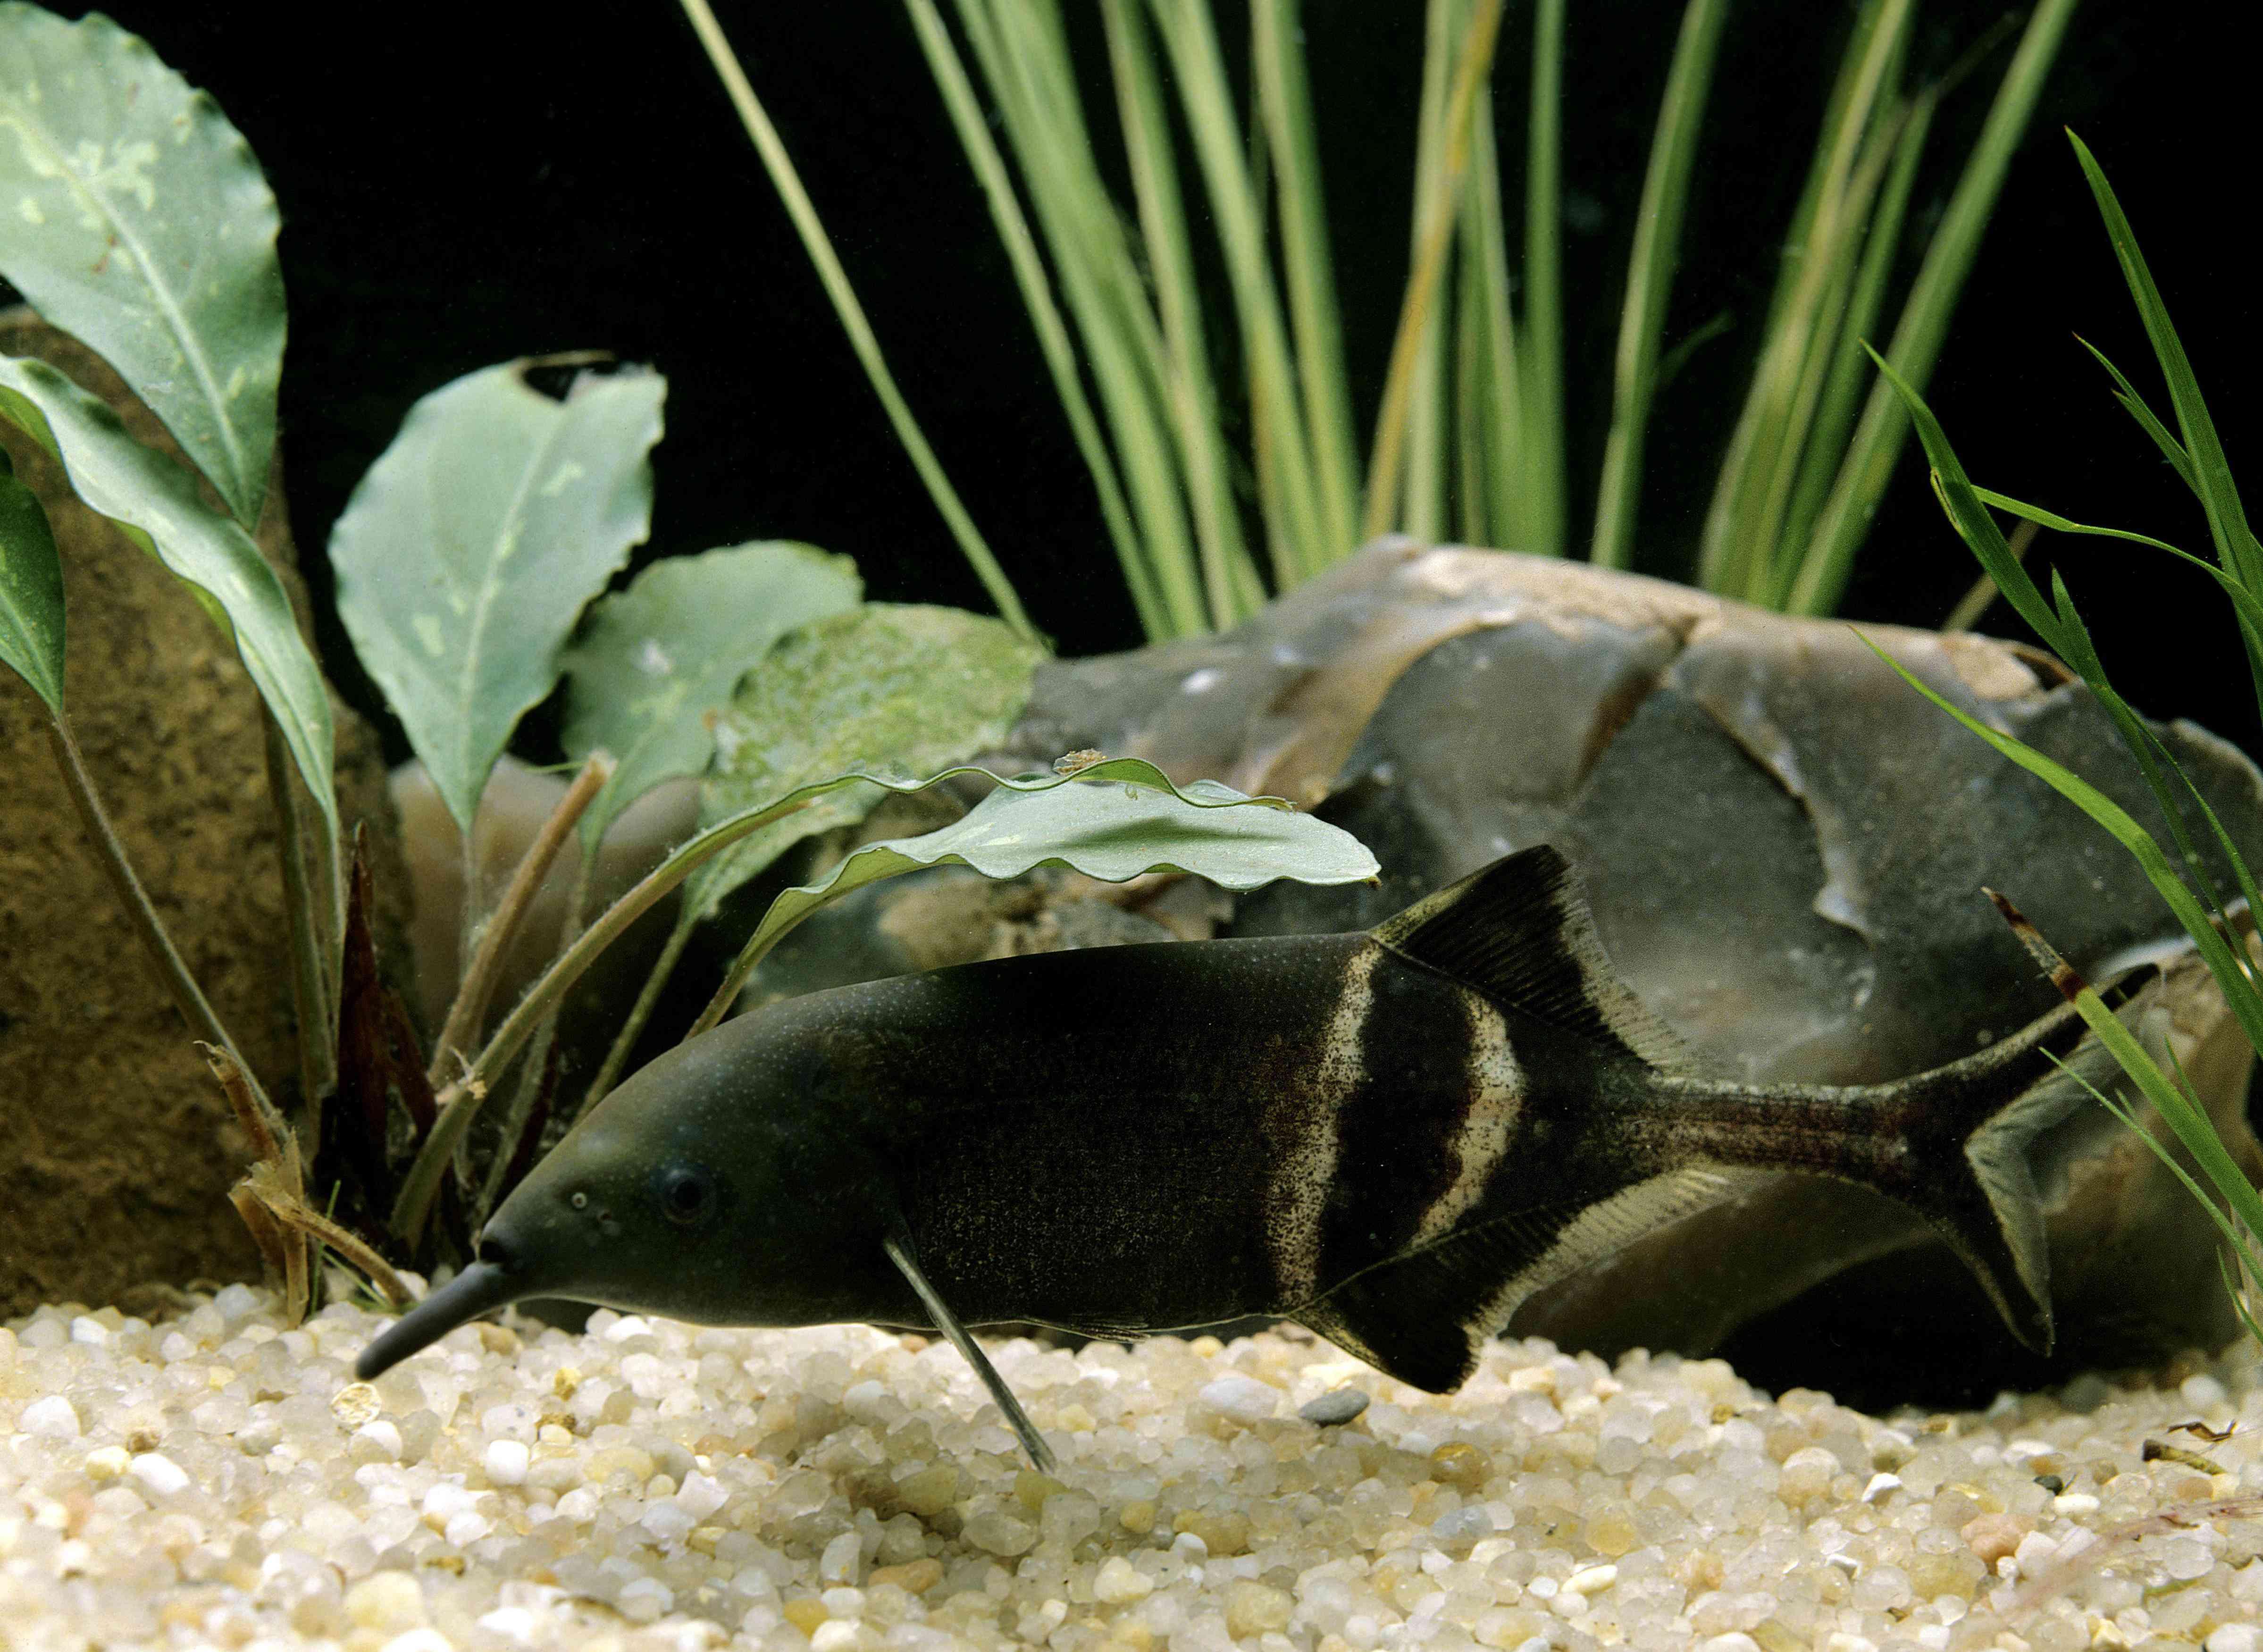 A black elephantnose fish underwater with green plants around him.